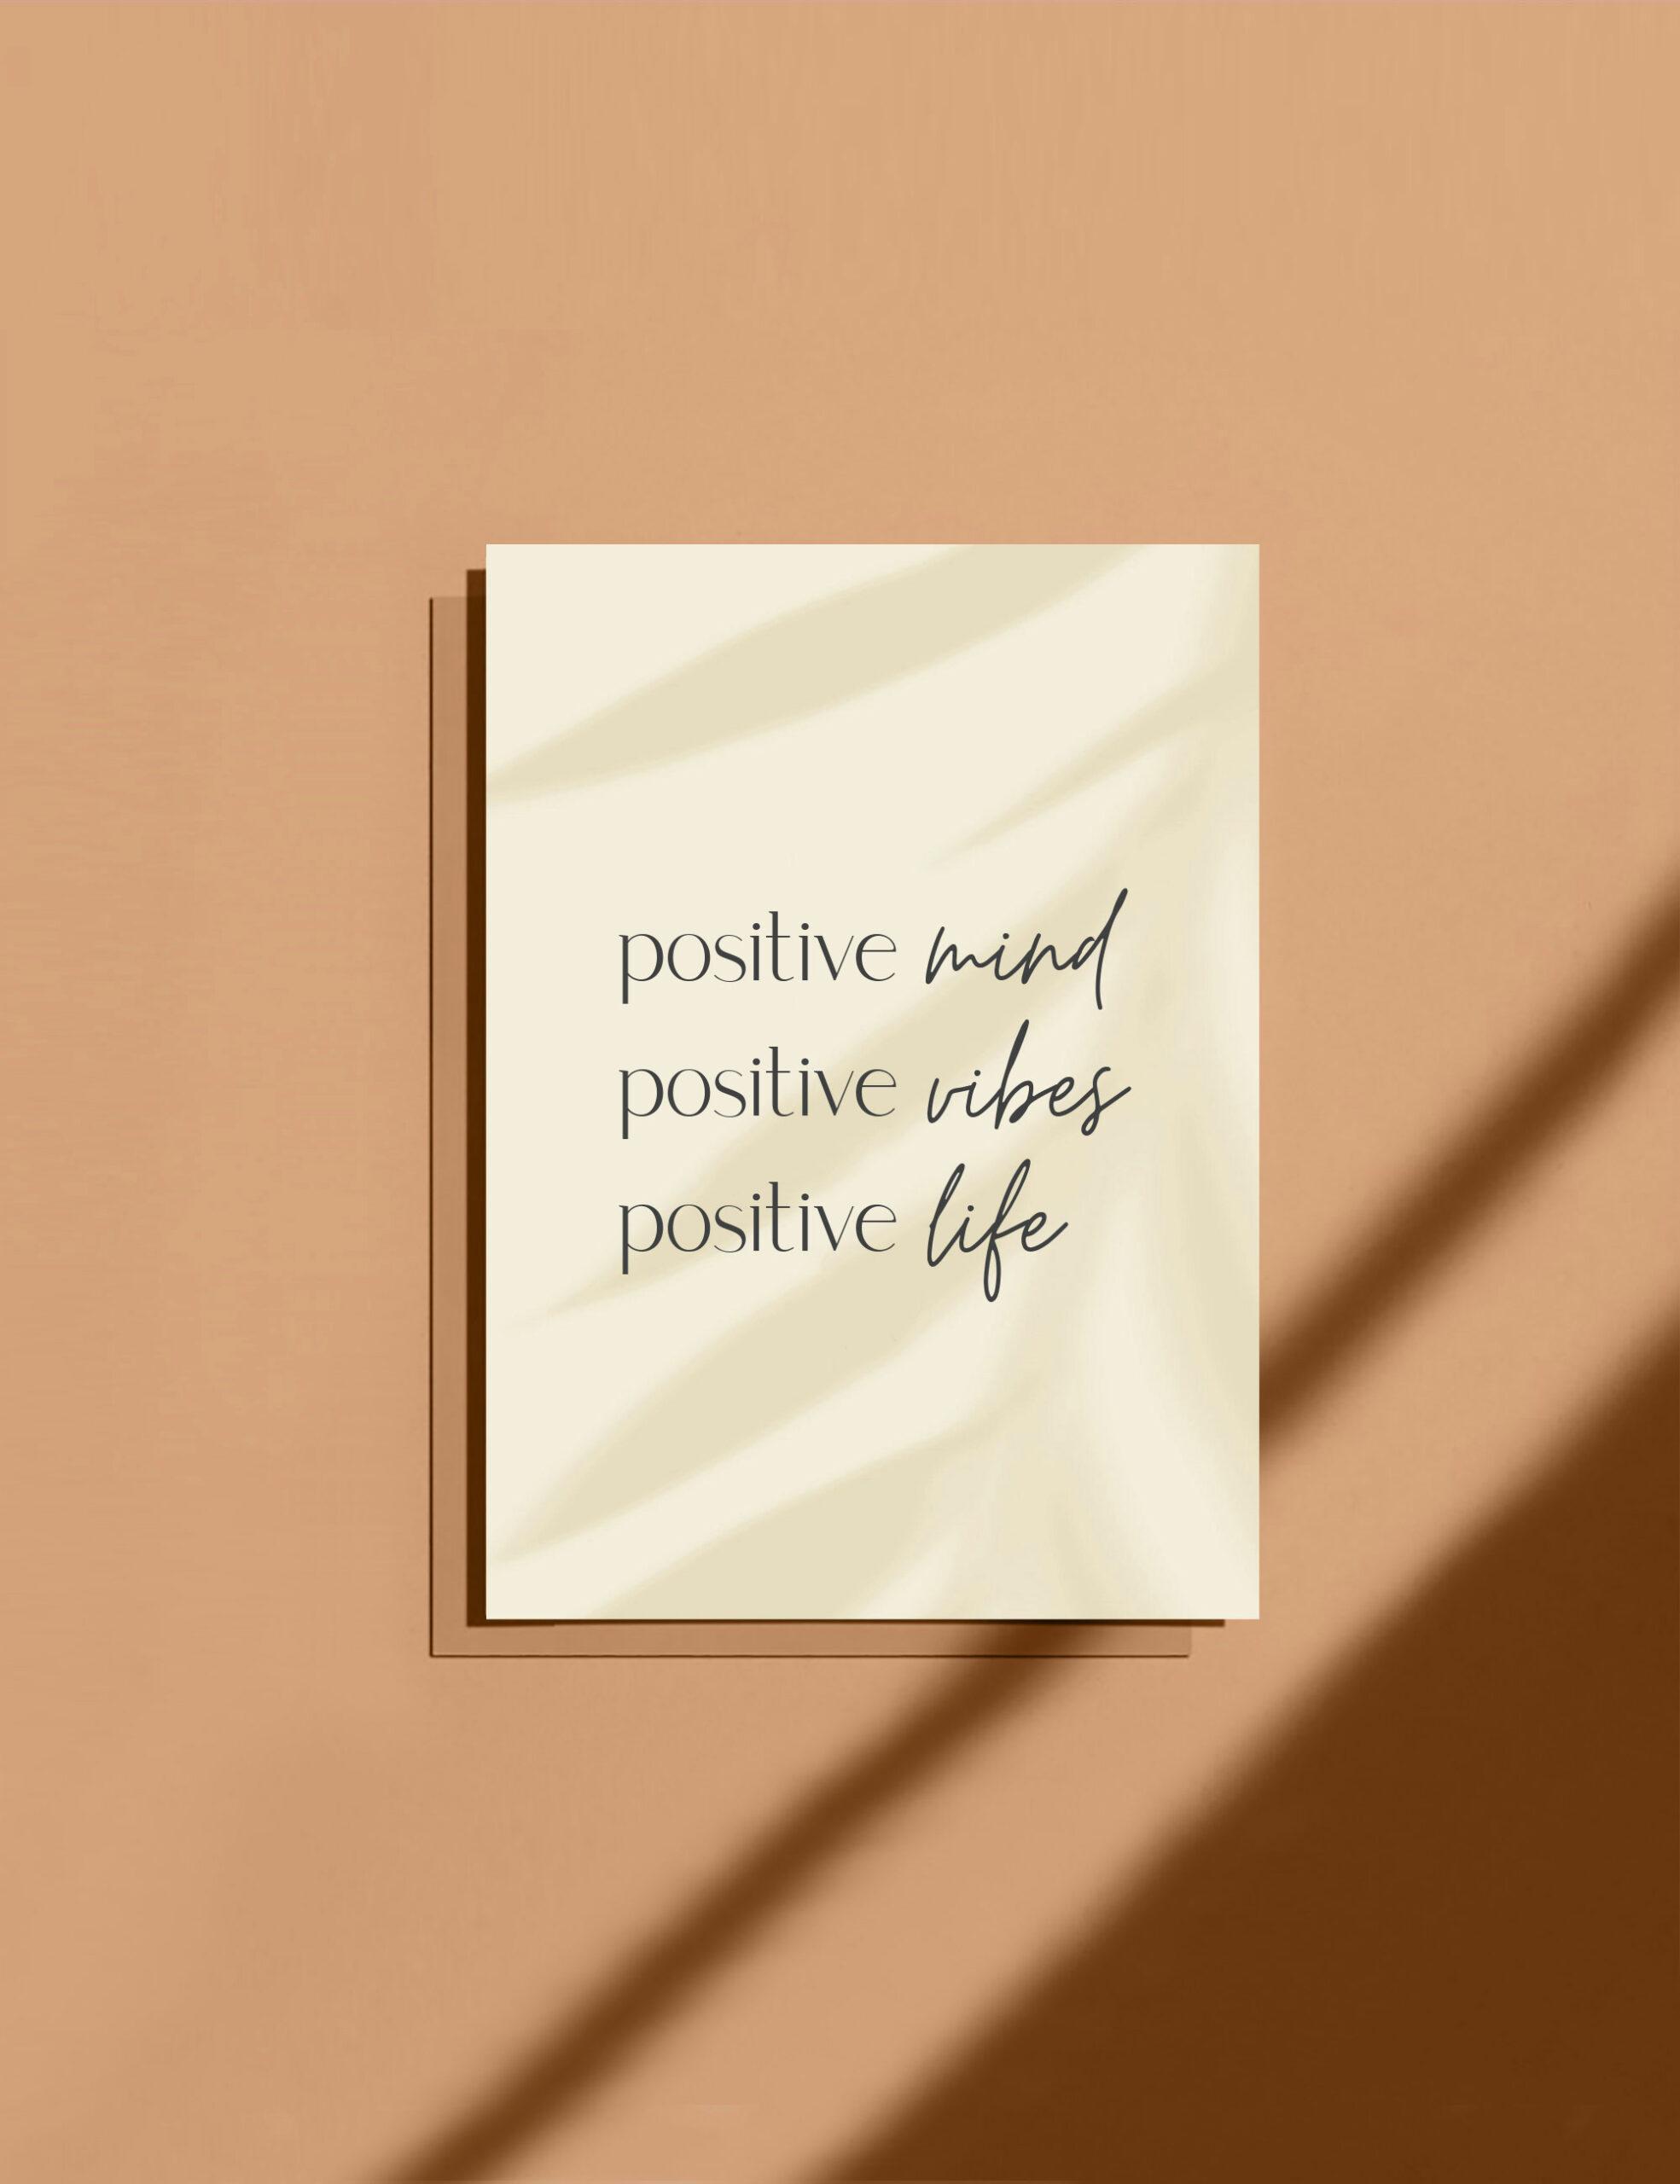 carte positive mind positive vibes